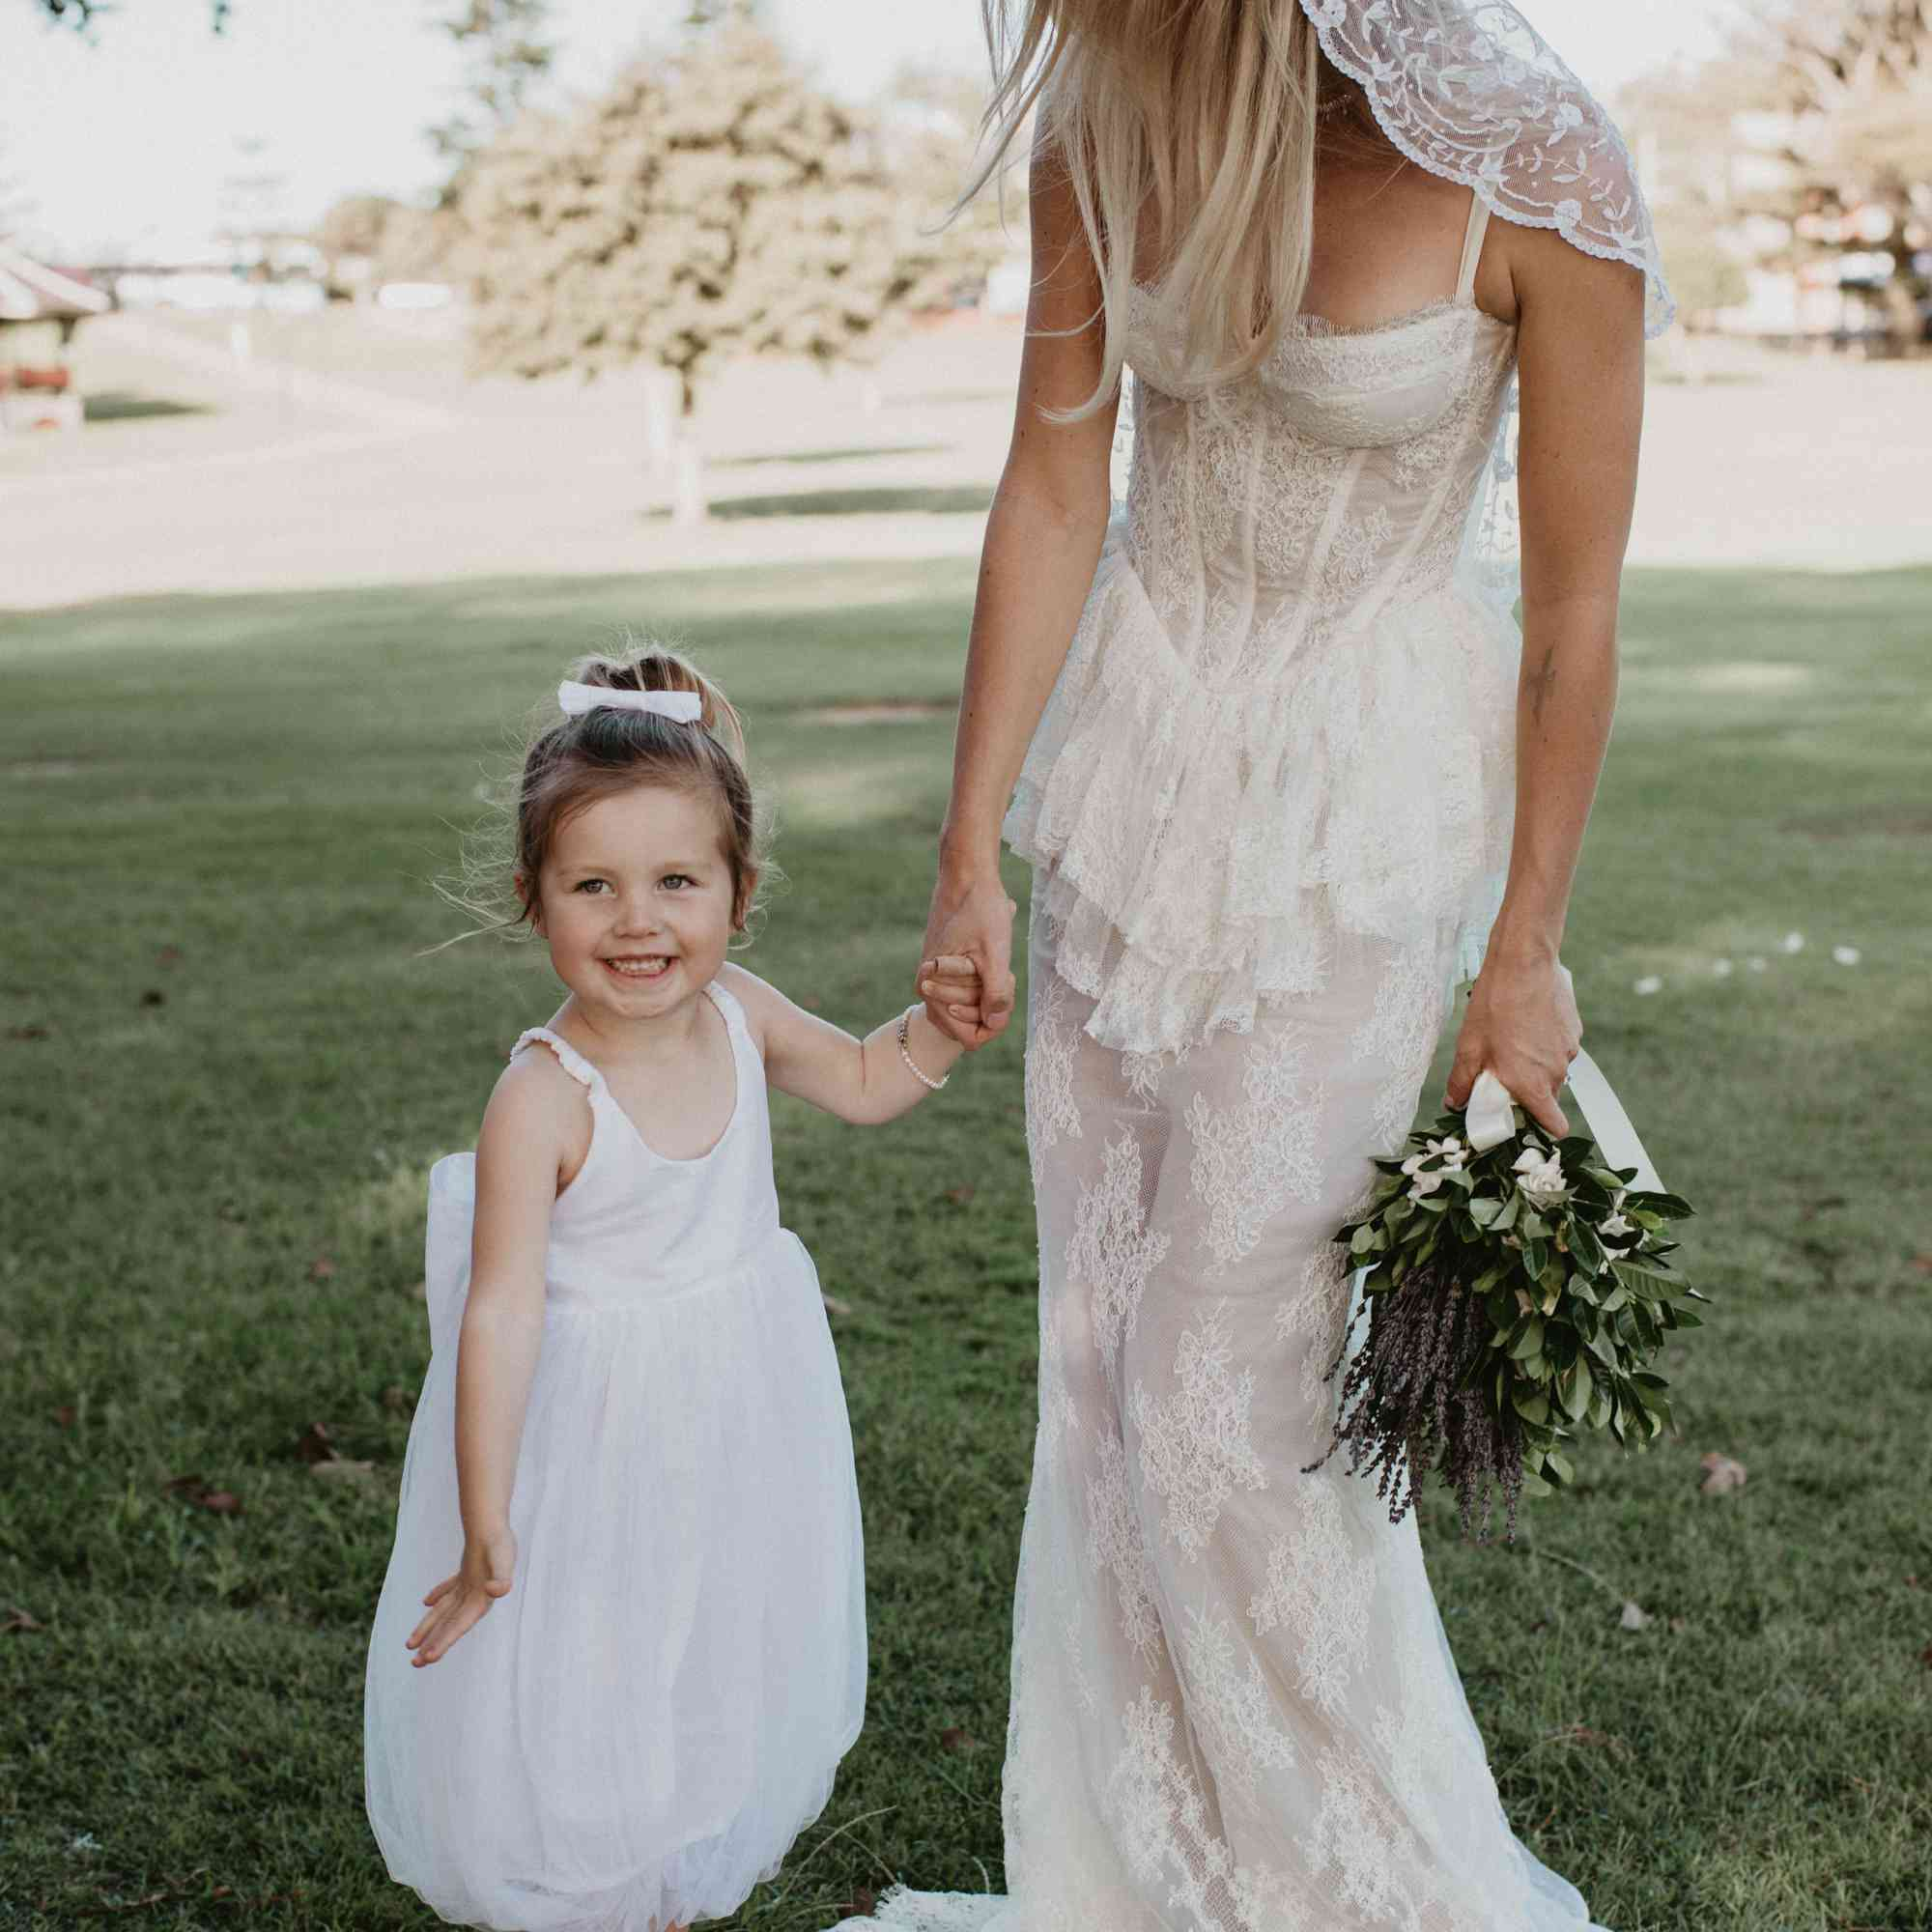 Vintage Wedding Dresses Bay Area: Stone Cold Fox Designer Cydney Morris's Vintage-Inspired